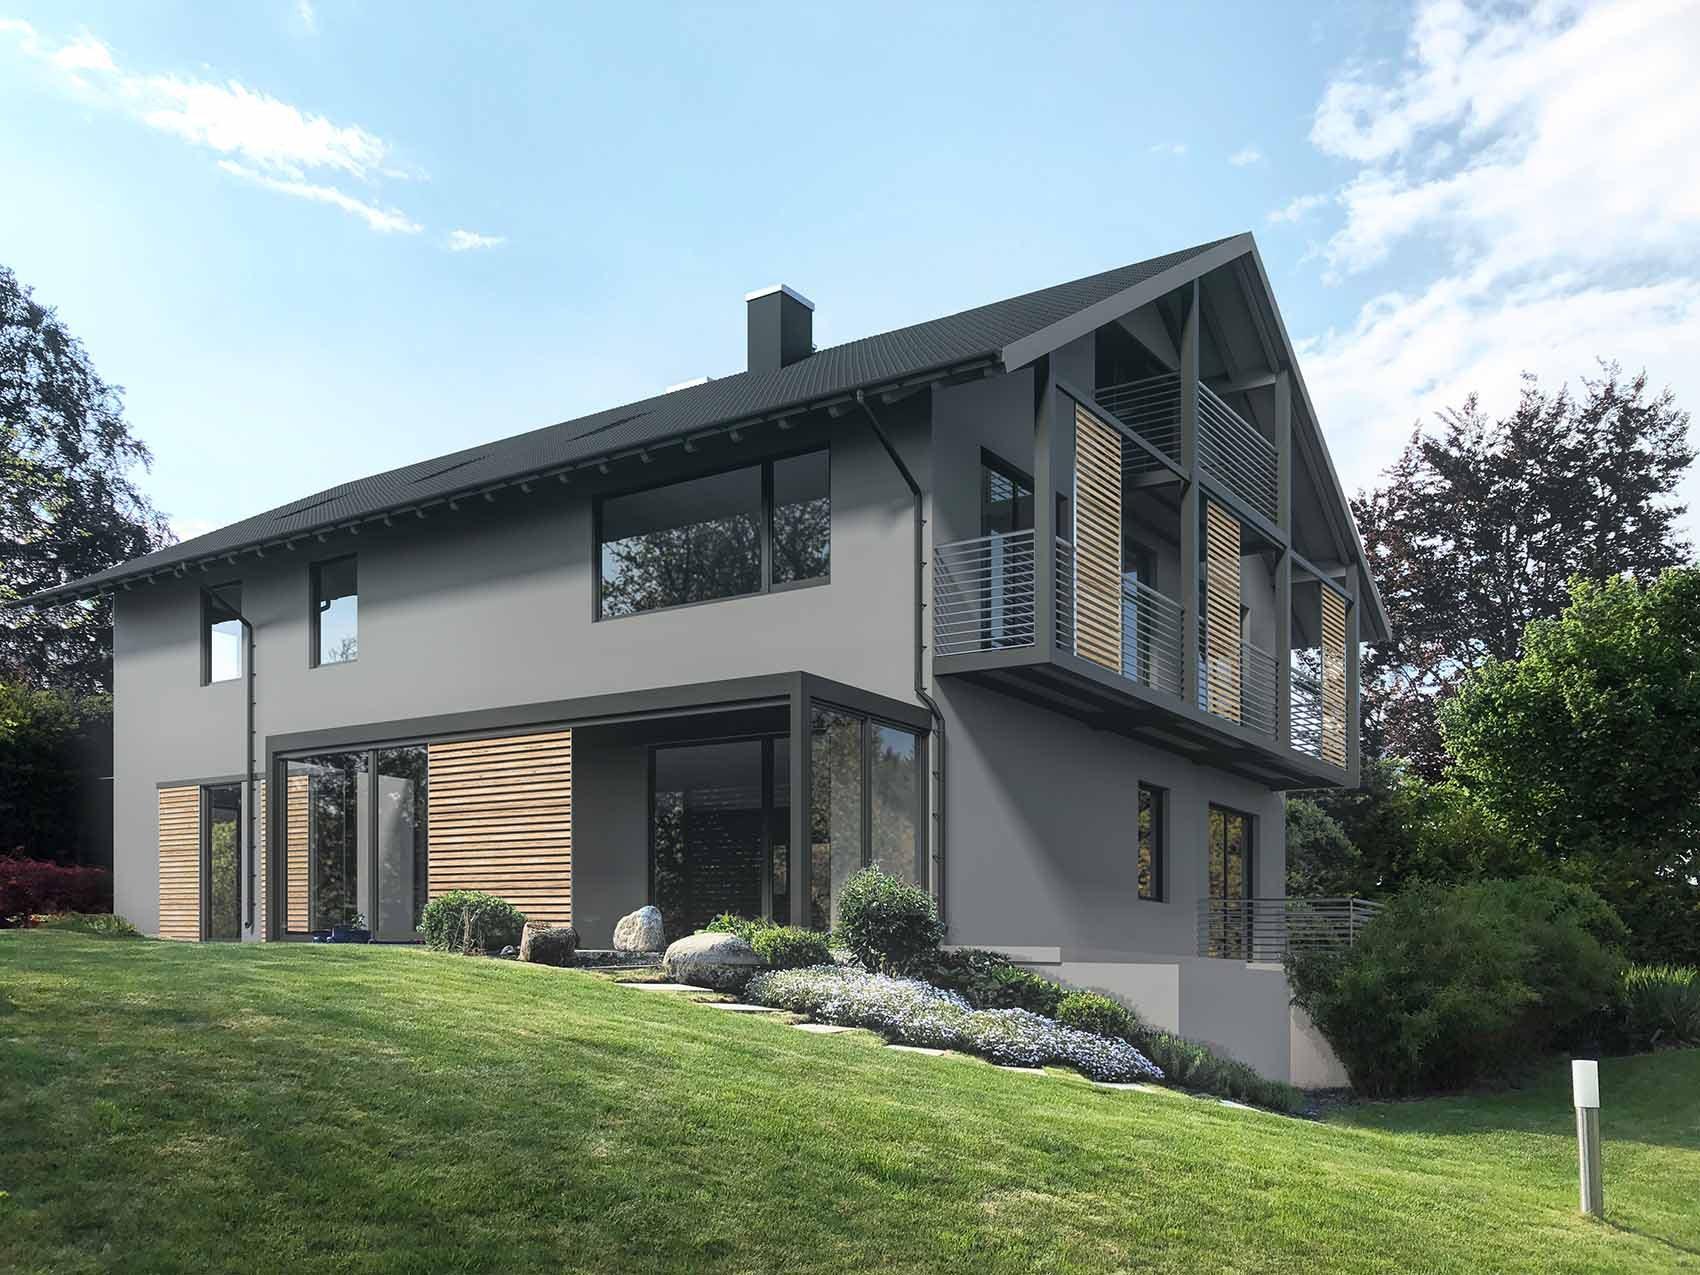 3D Rendering zur Fassadengestalltung